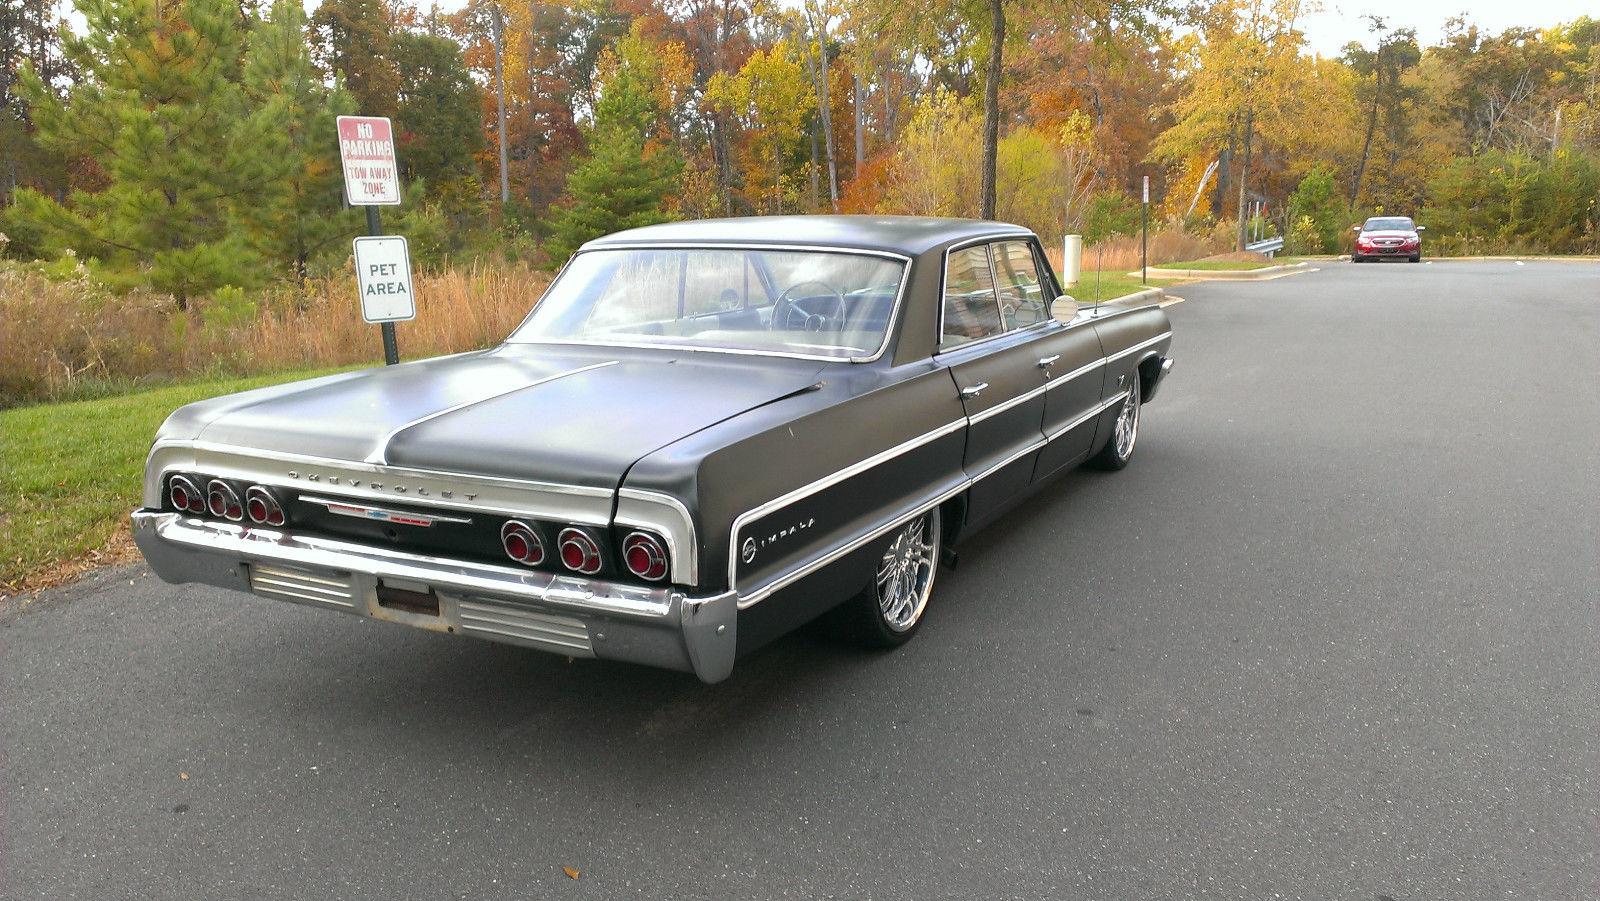 1964 chevrolet impala 4 door hardtop v 8 350 classic chevrolet impala 1964 for sale. Black Bedroom Furniture Sets. Home Design Ideas